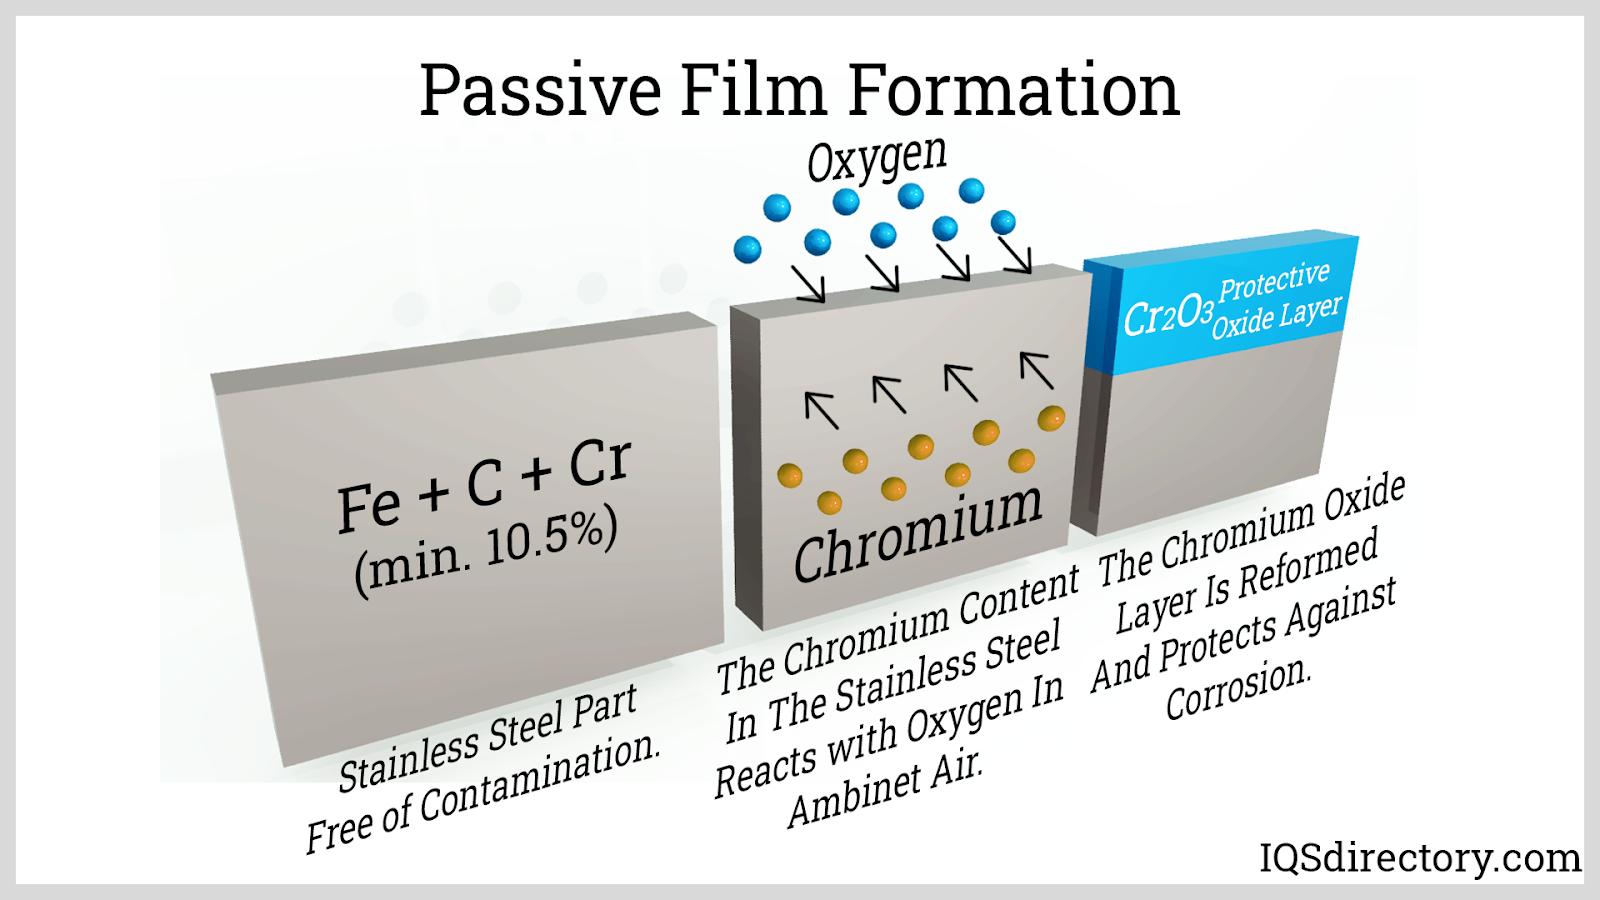 Passive Film Formation